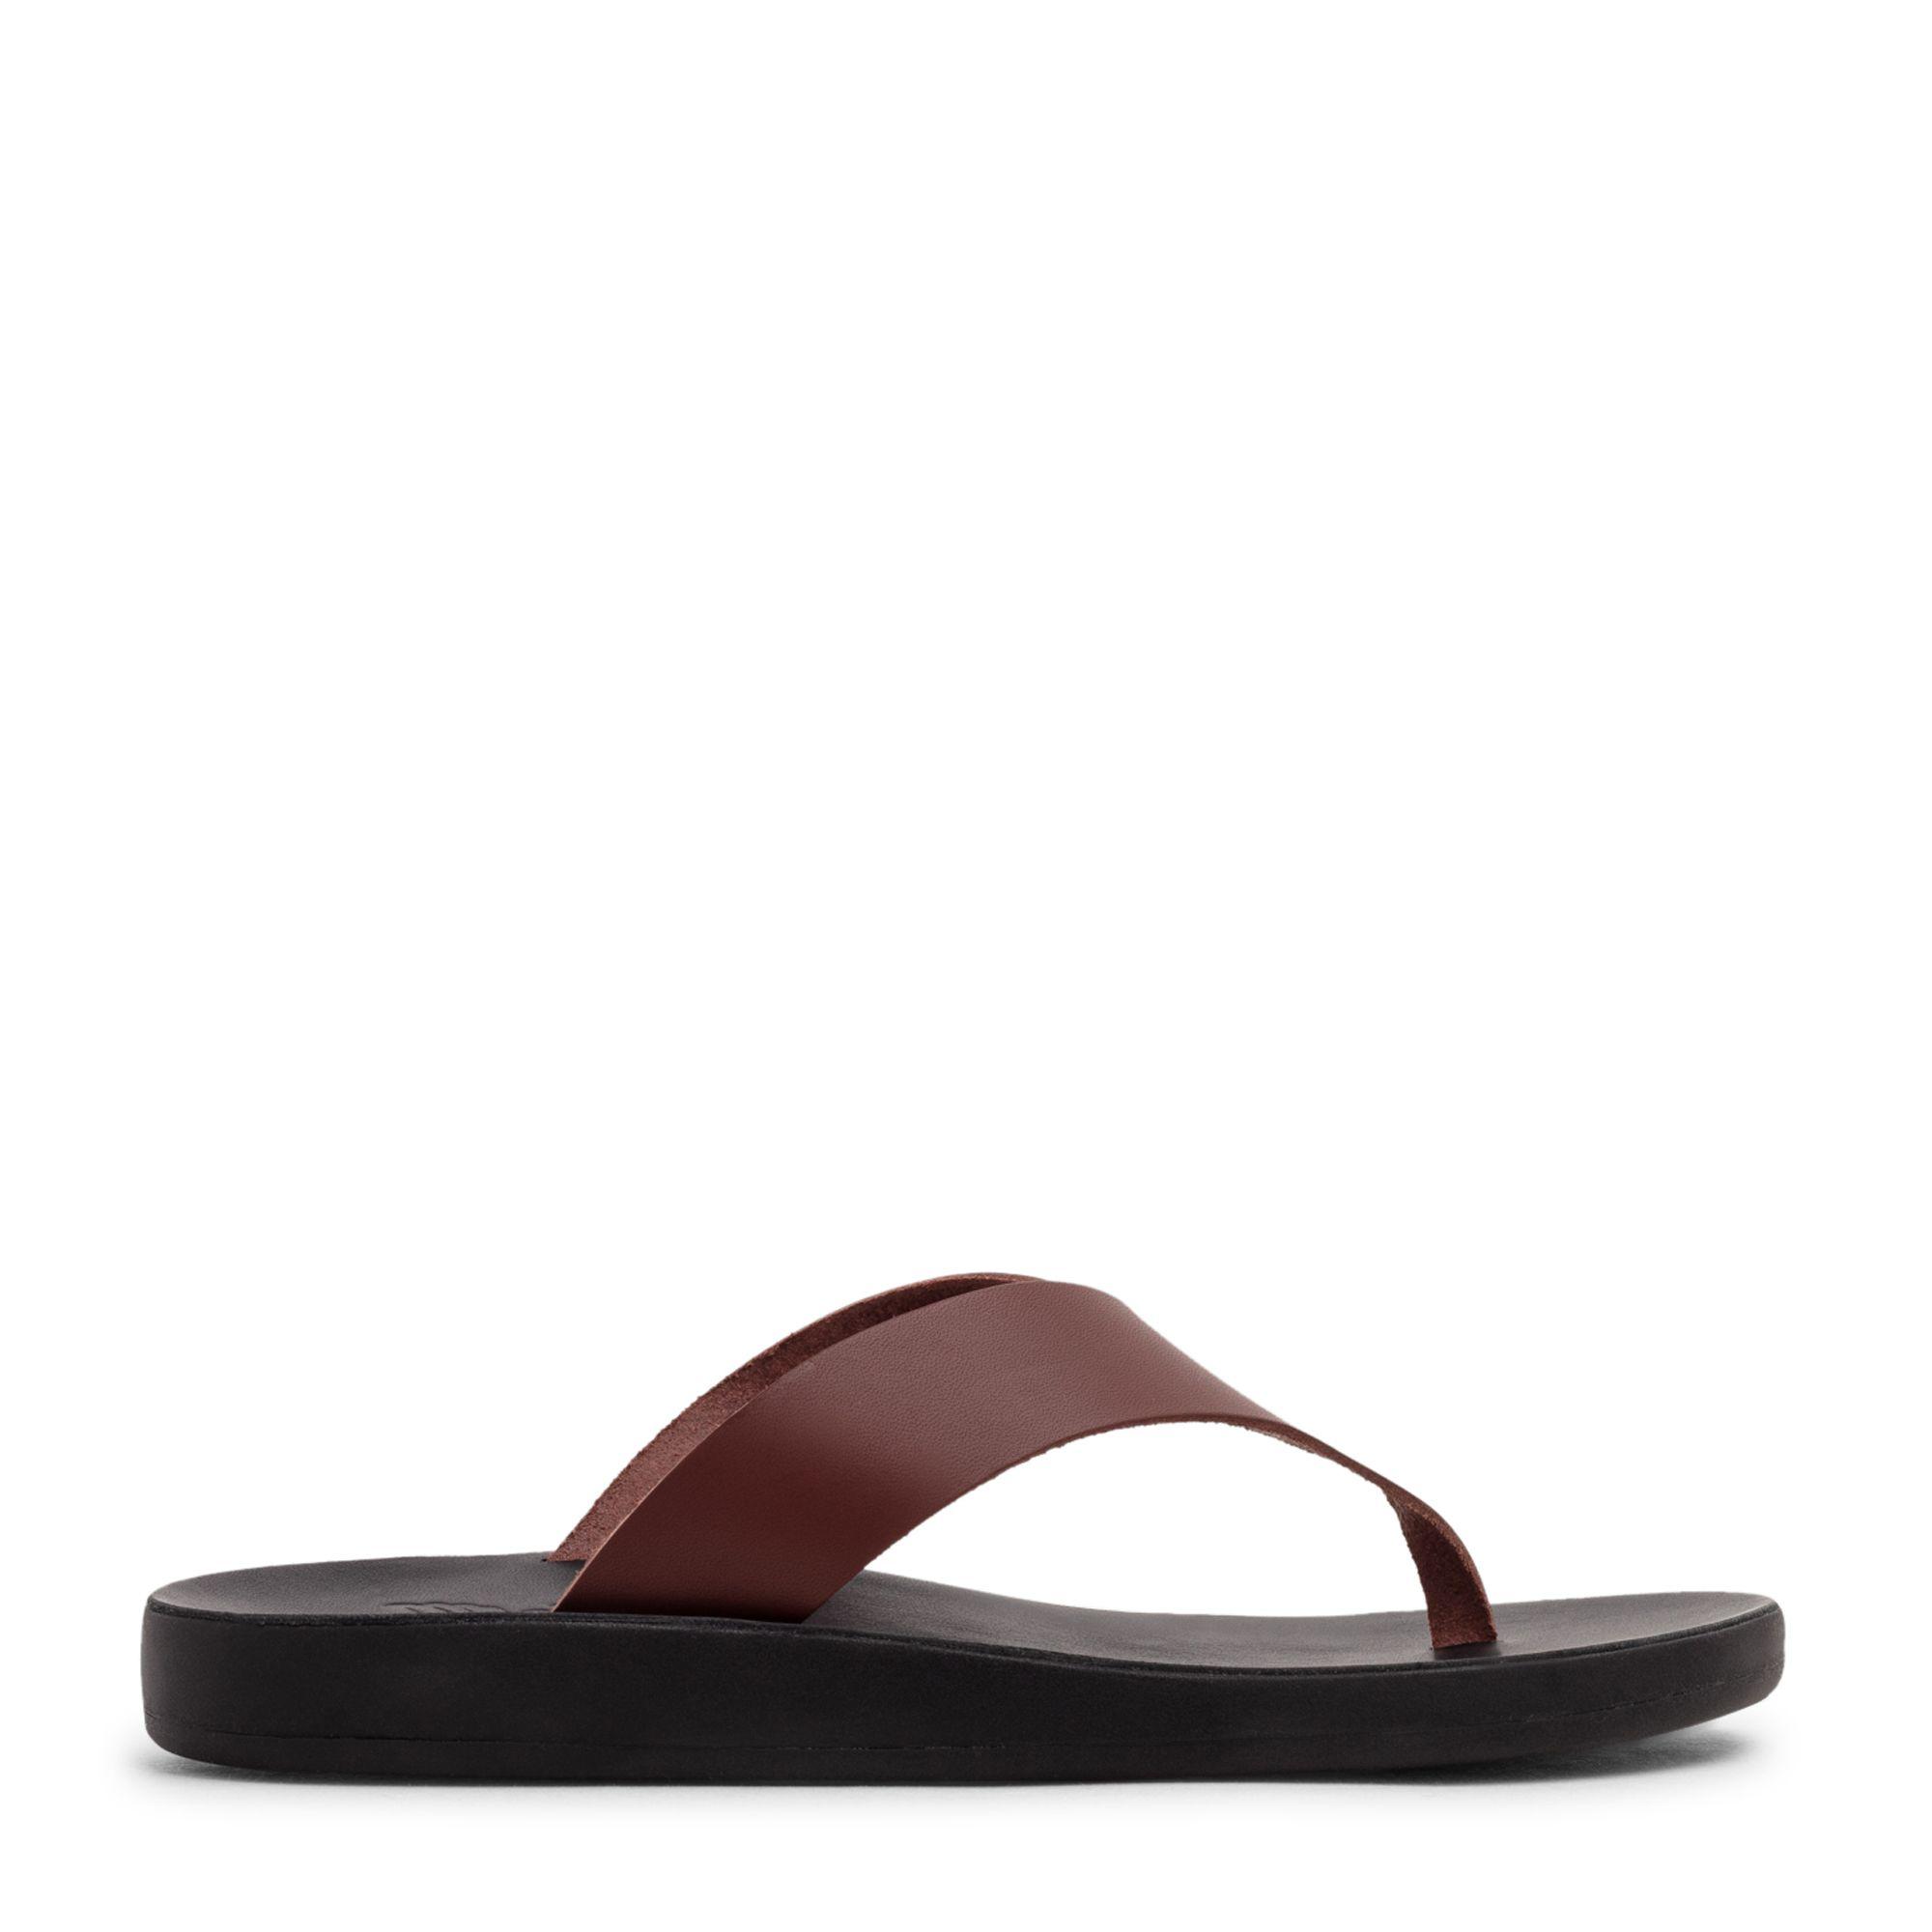 Charys Comfort sandals